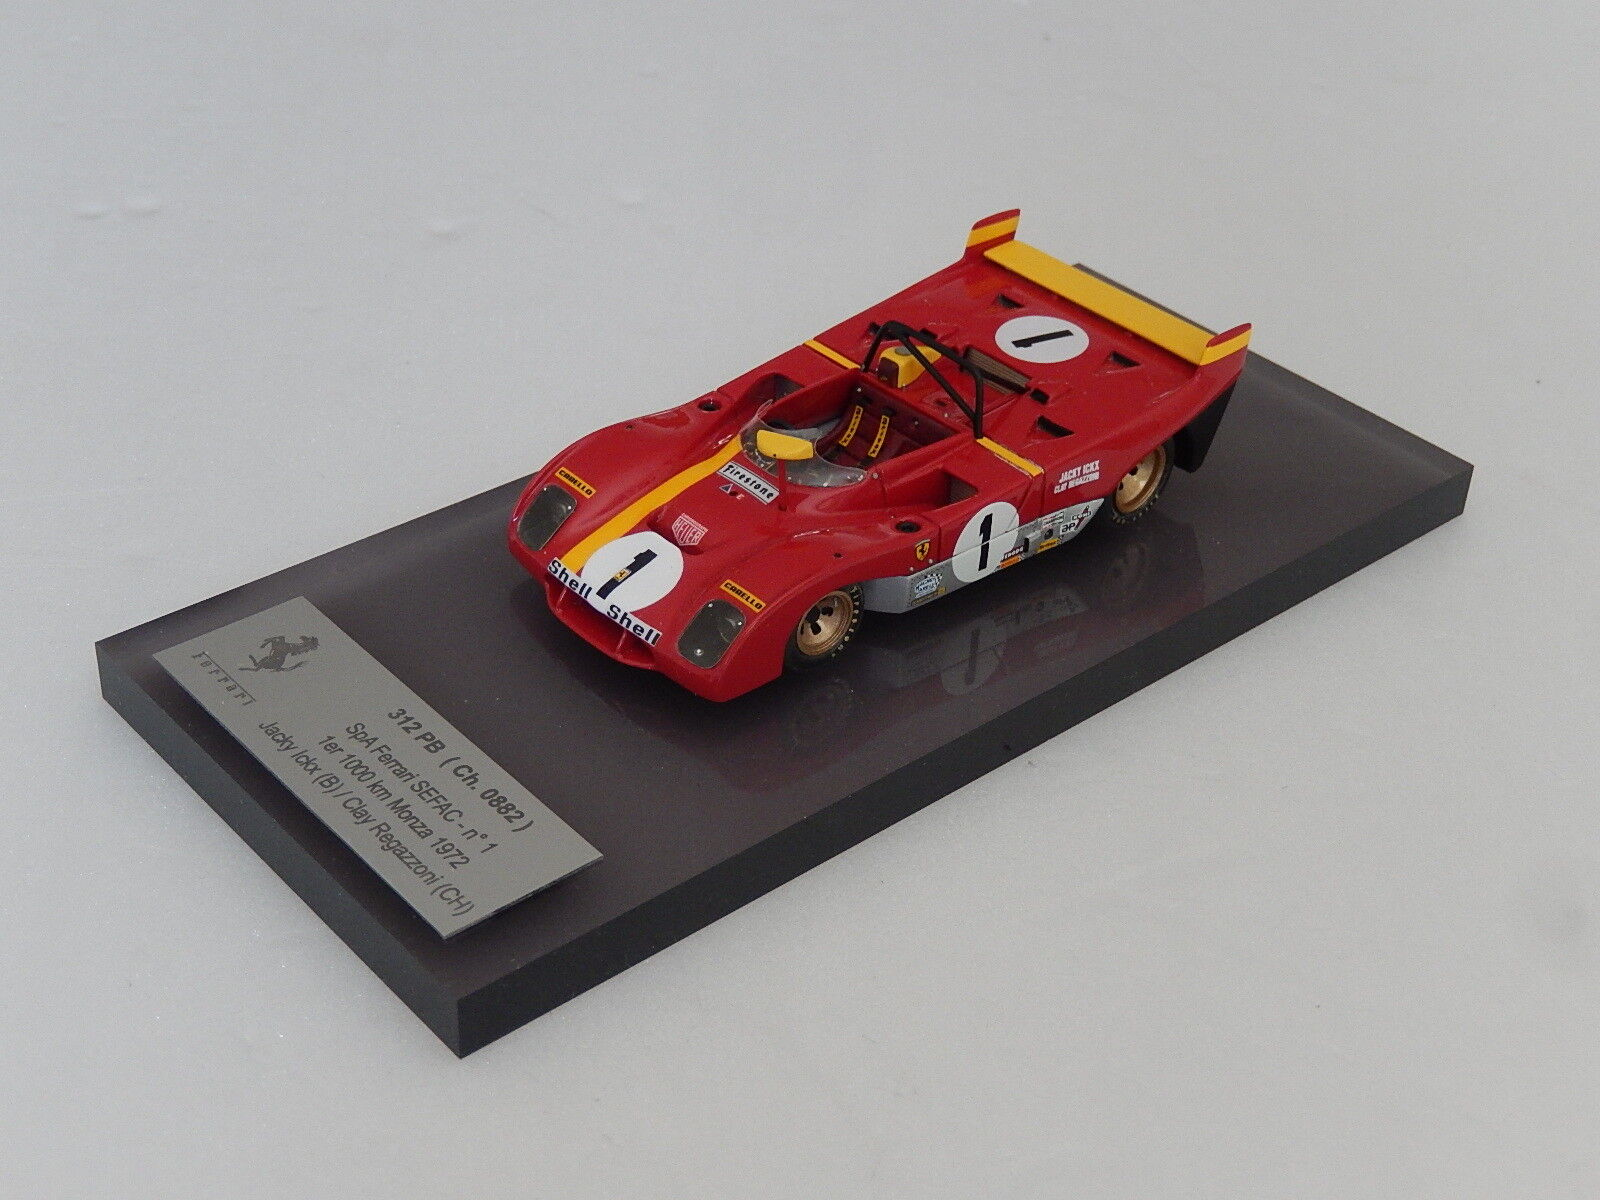 1 43 Tameo built by Alberca Ferrari 312 PB winner Monza 1972   n amr hiro